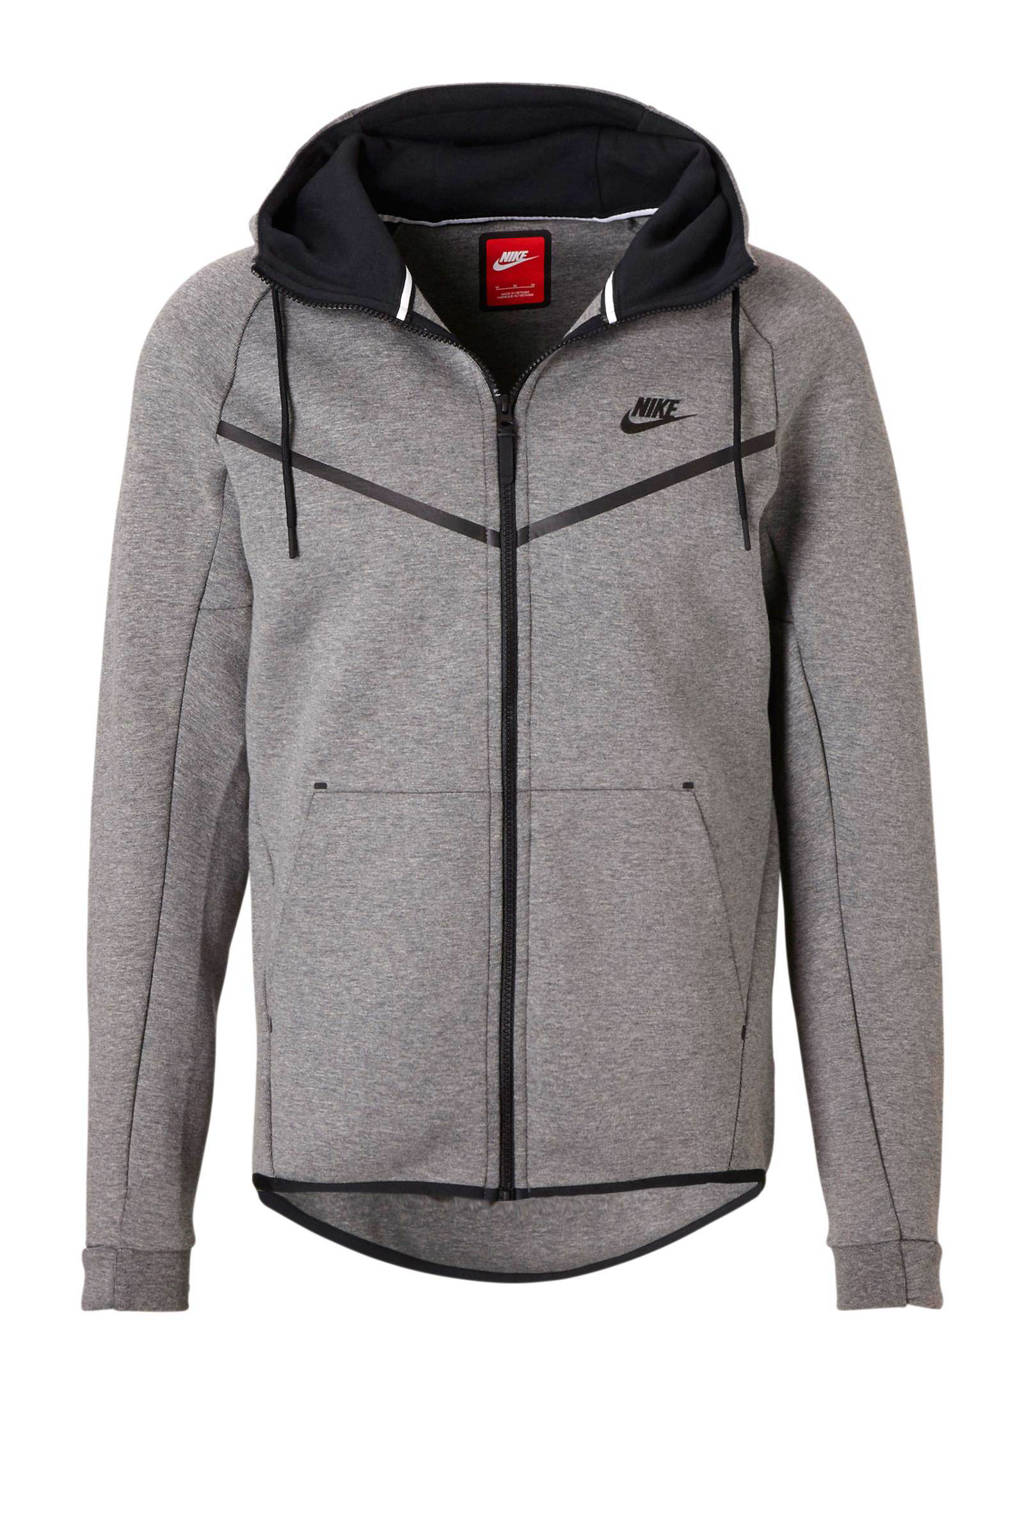 827e3f1f8d4 Nike Tech Fleece vest, Grijs melange